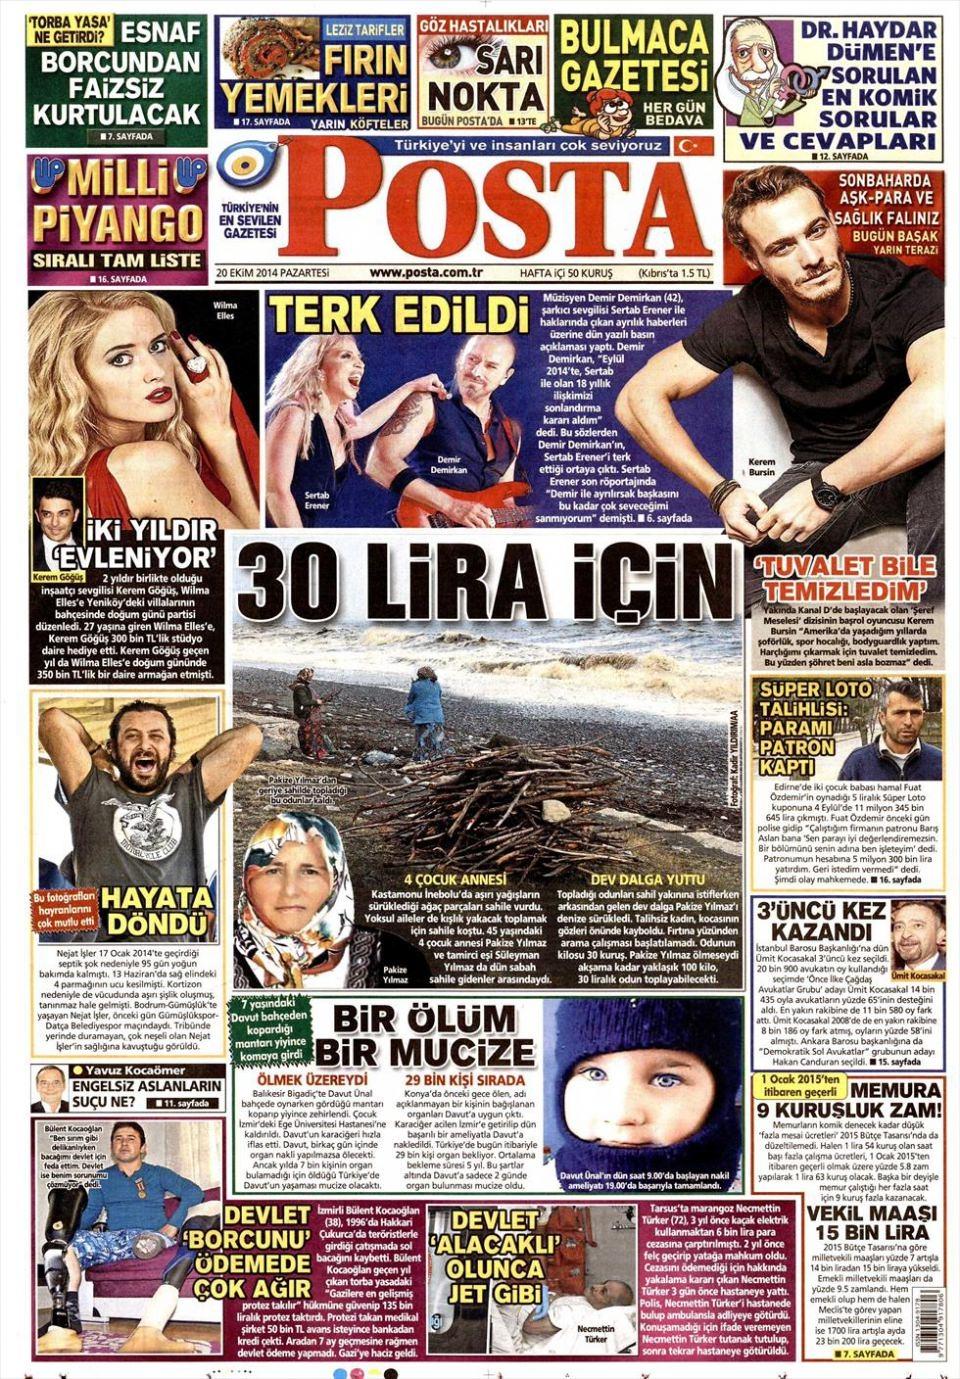 20 Ekim 2014 gazete manşetleri 14